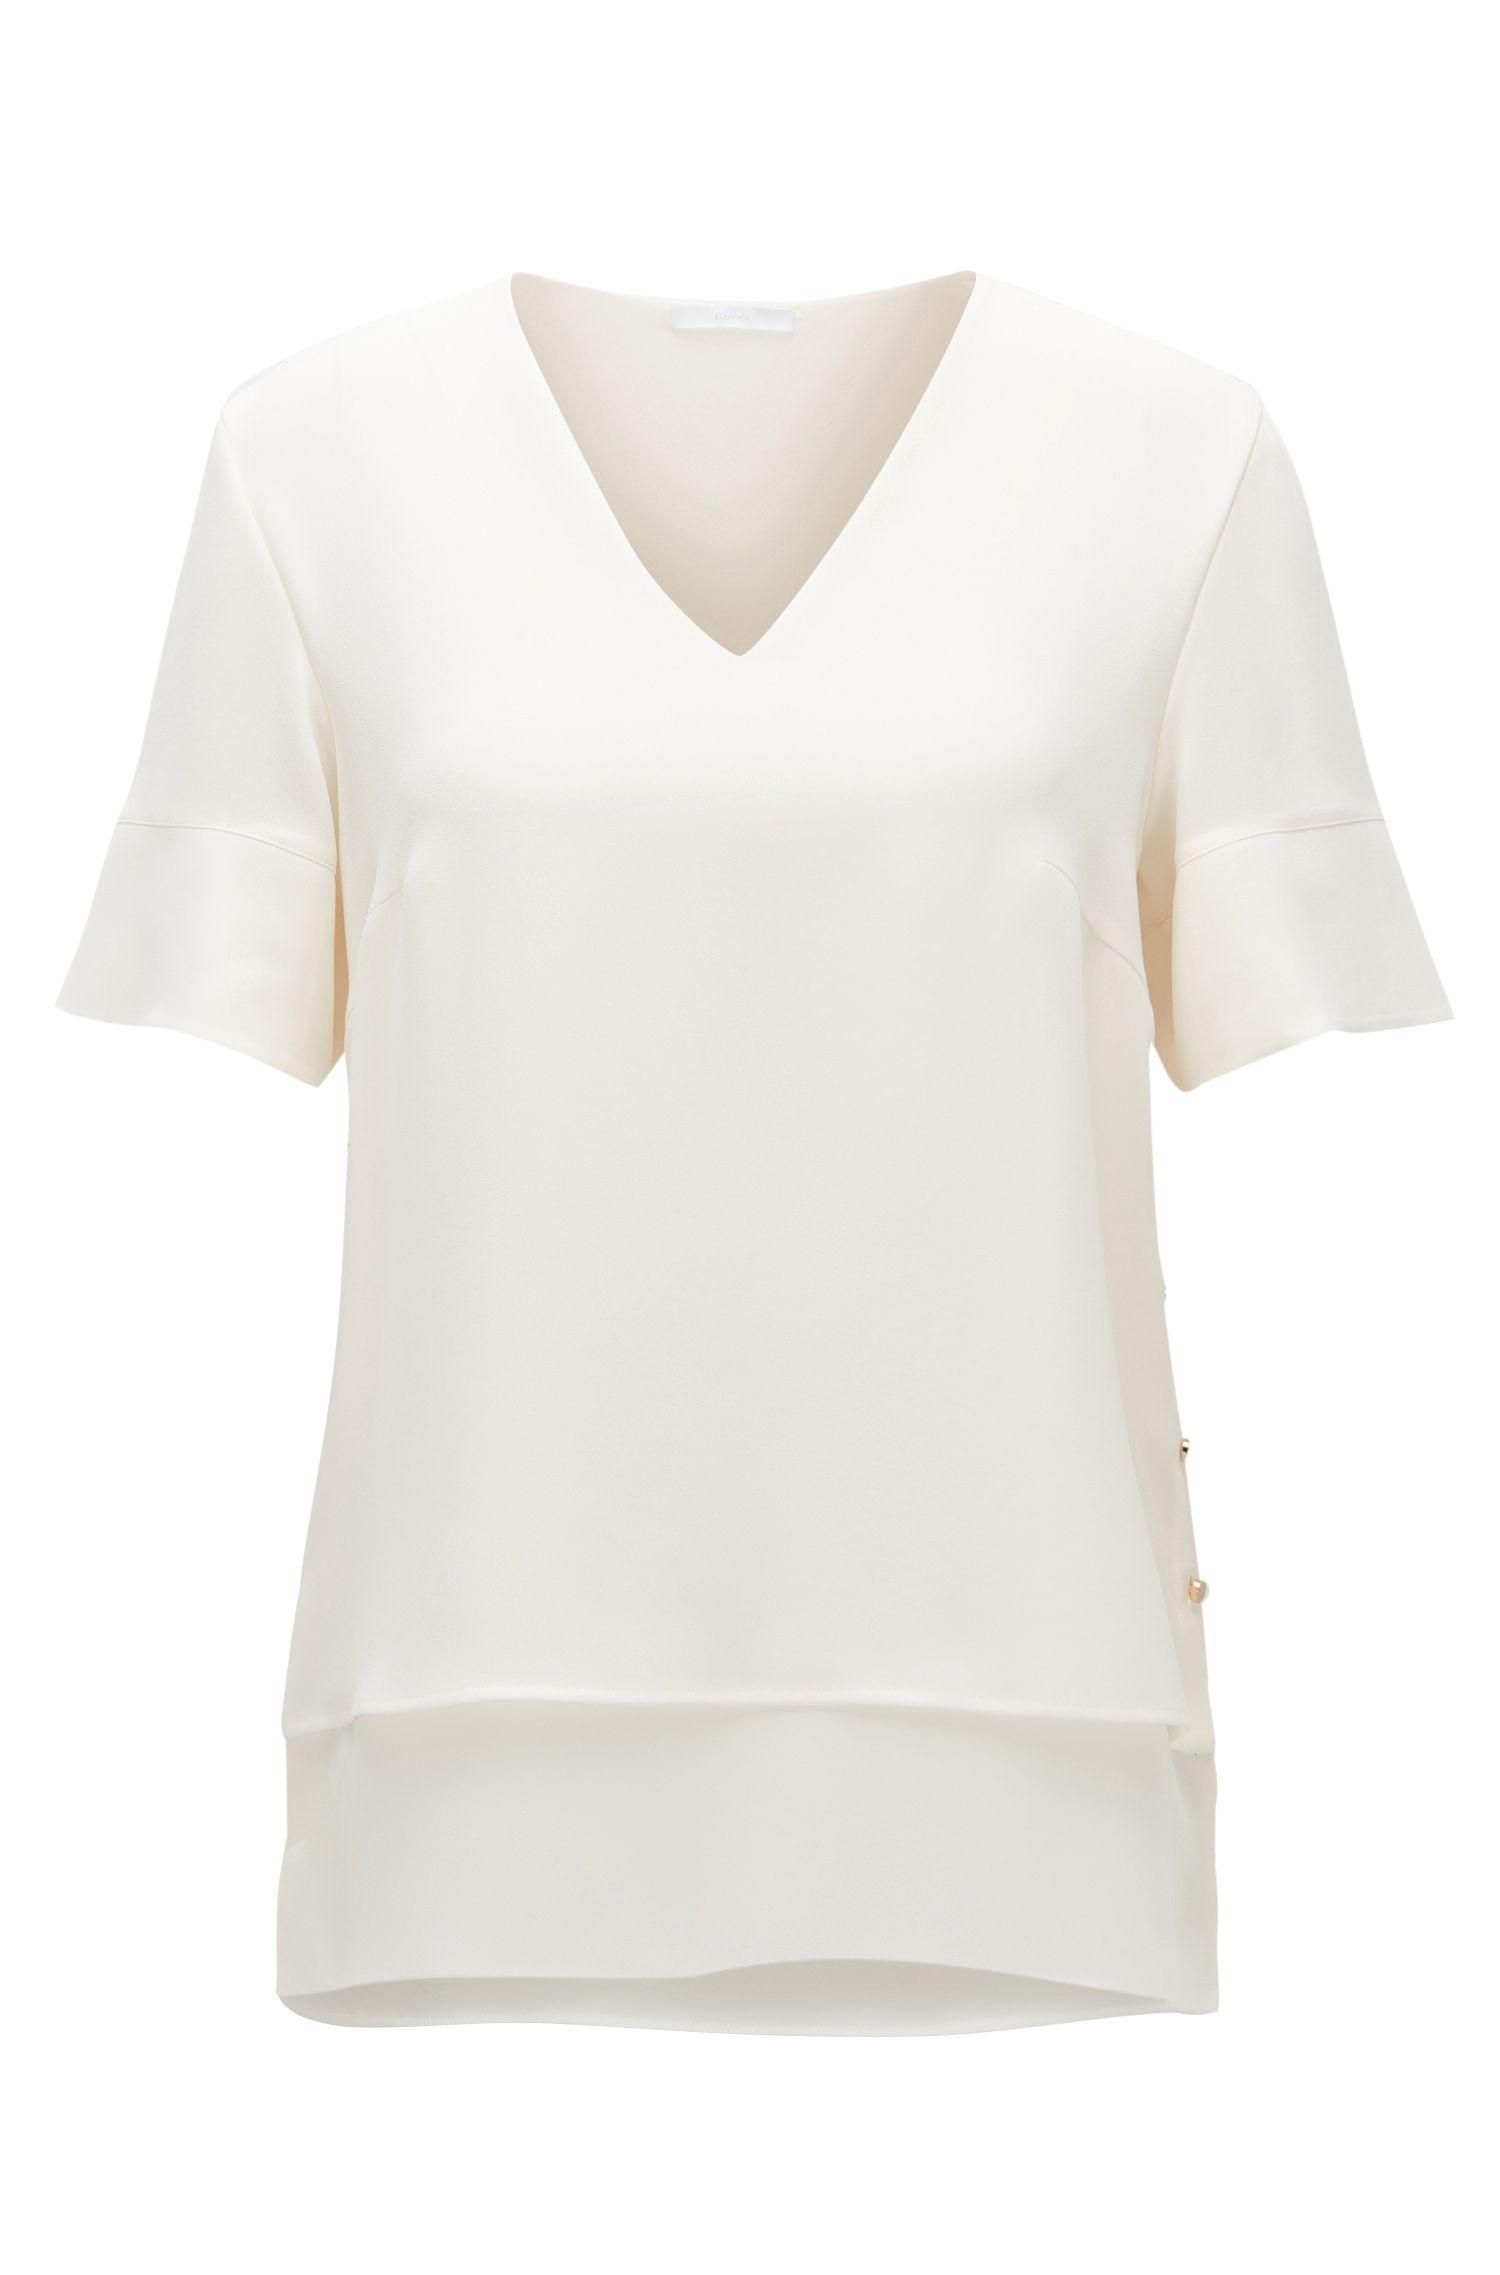 Camiseta de doble capa en tejido fluido